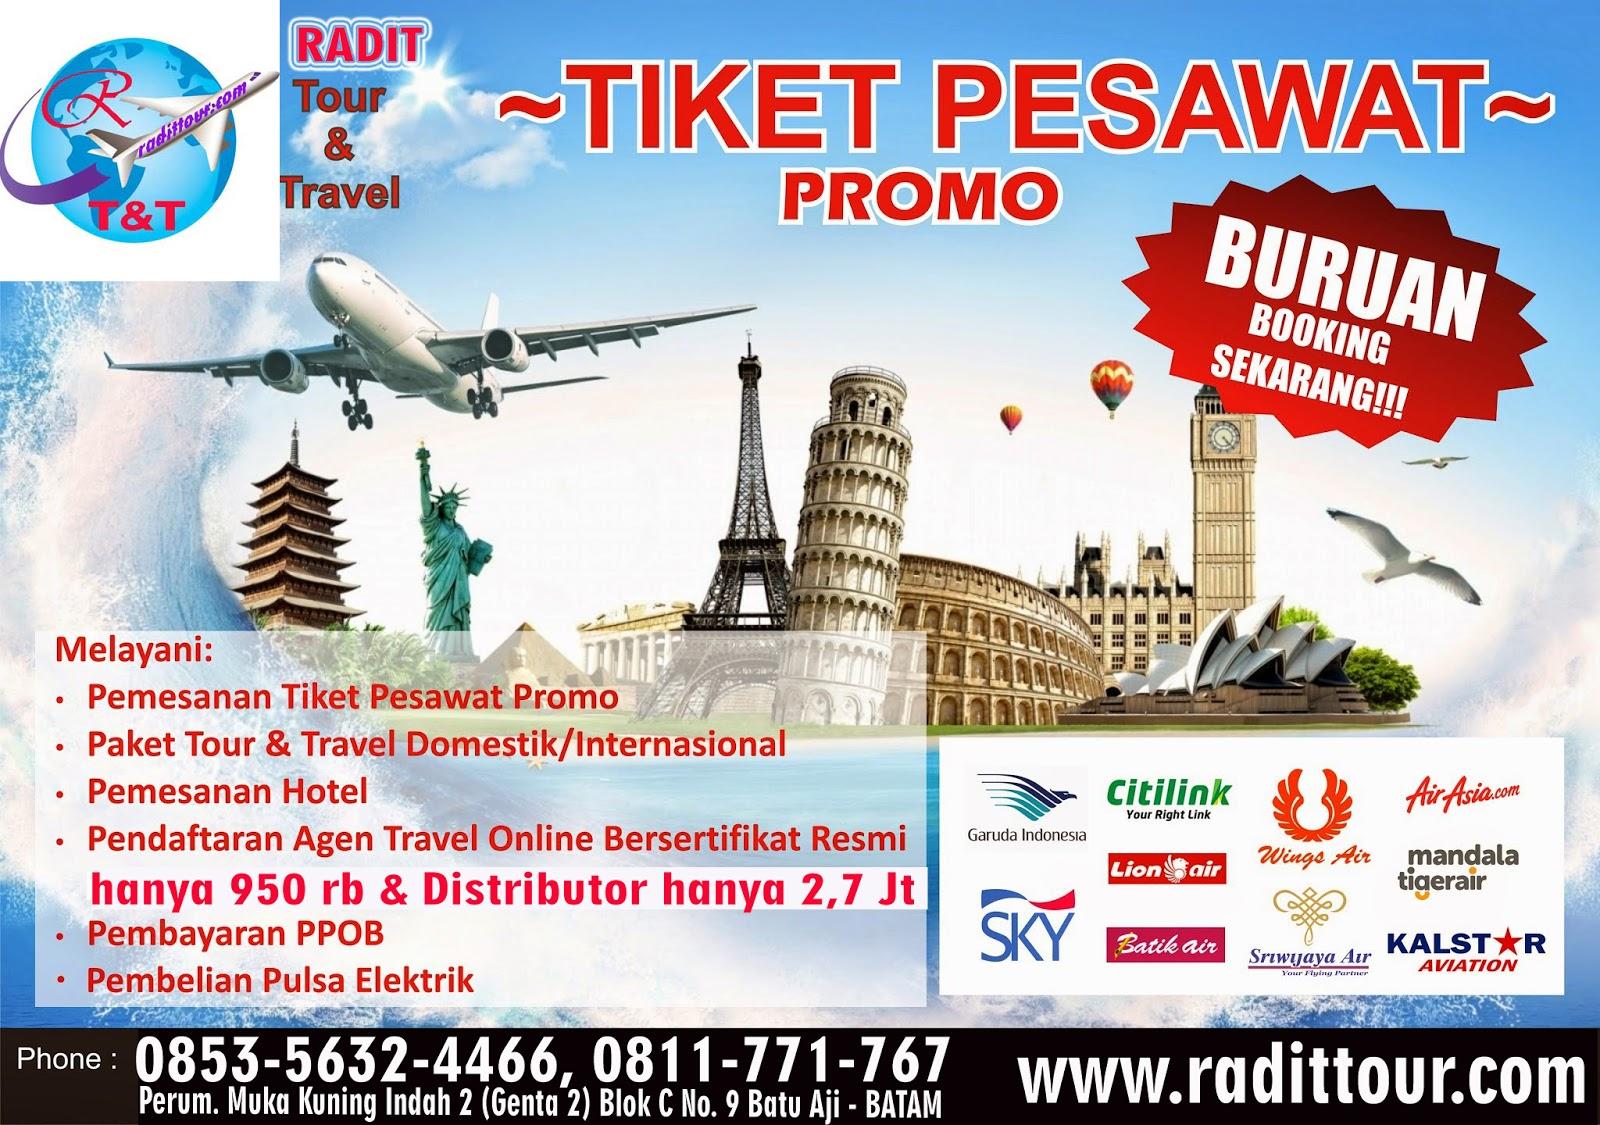 Radit Tour Dan Travel Batam